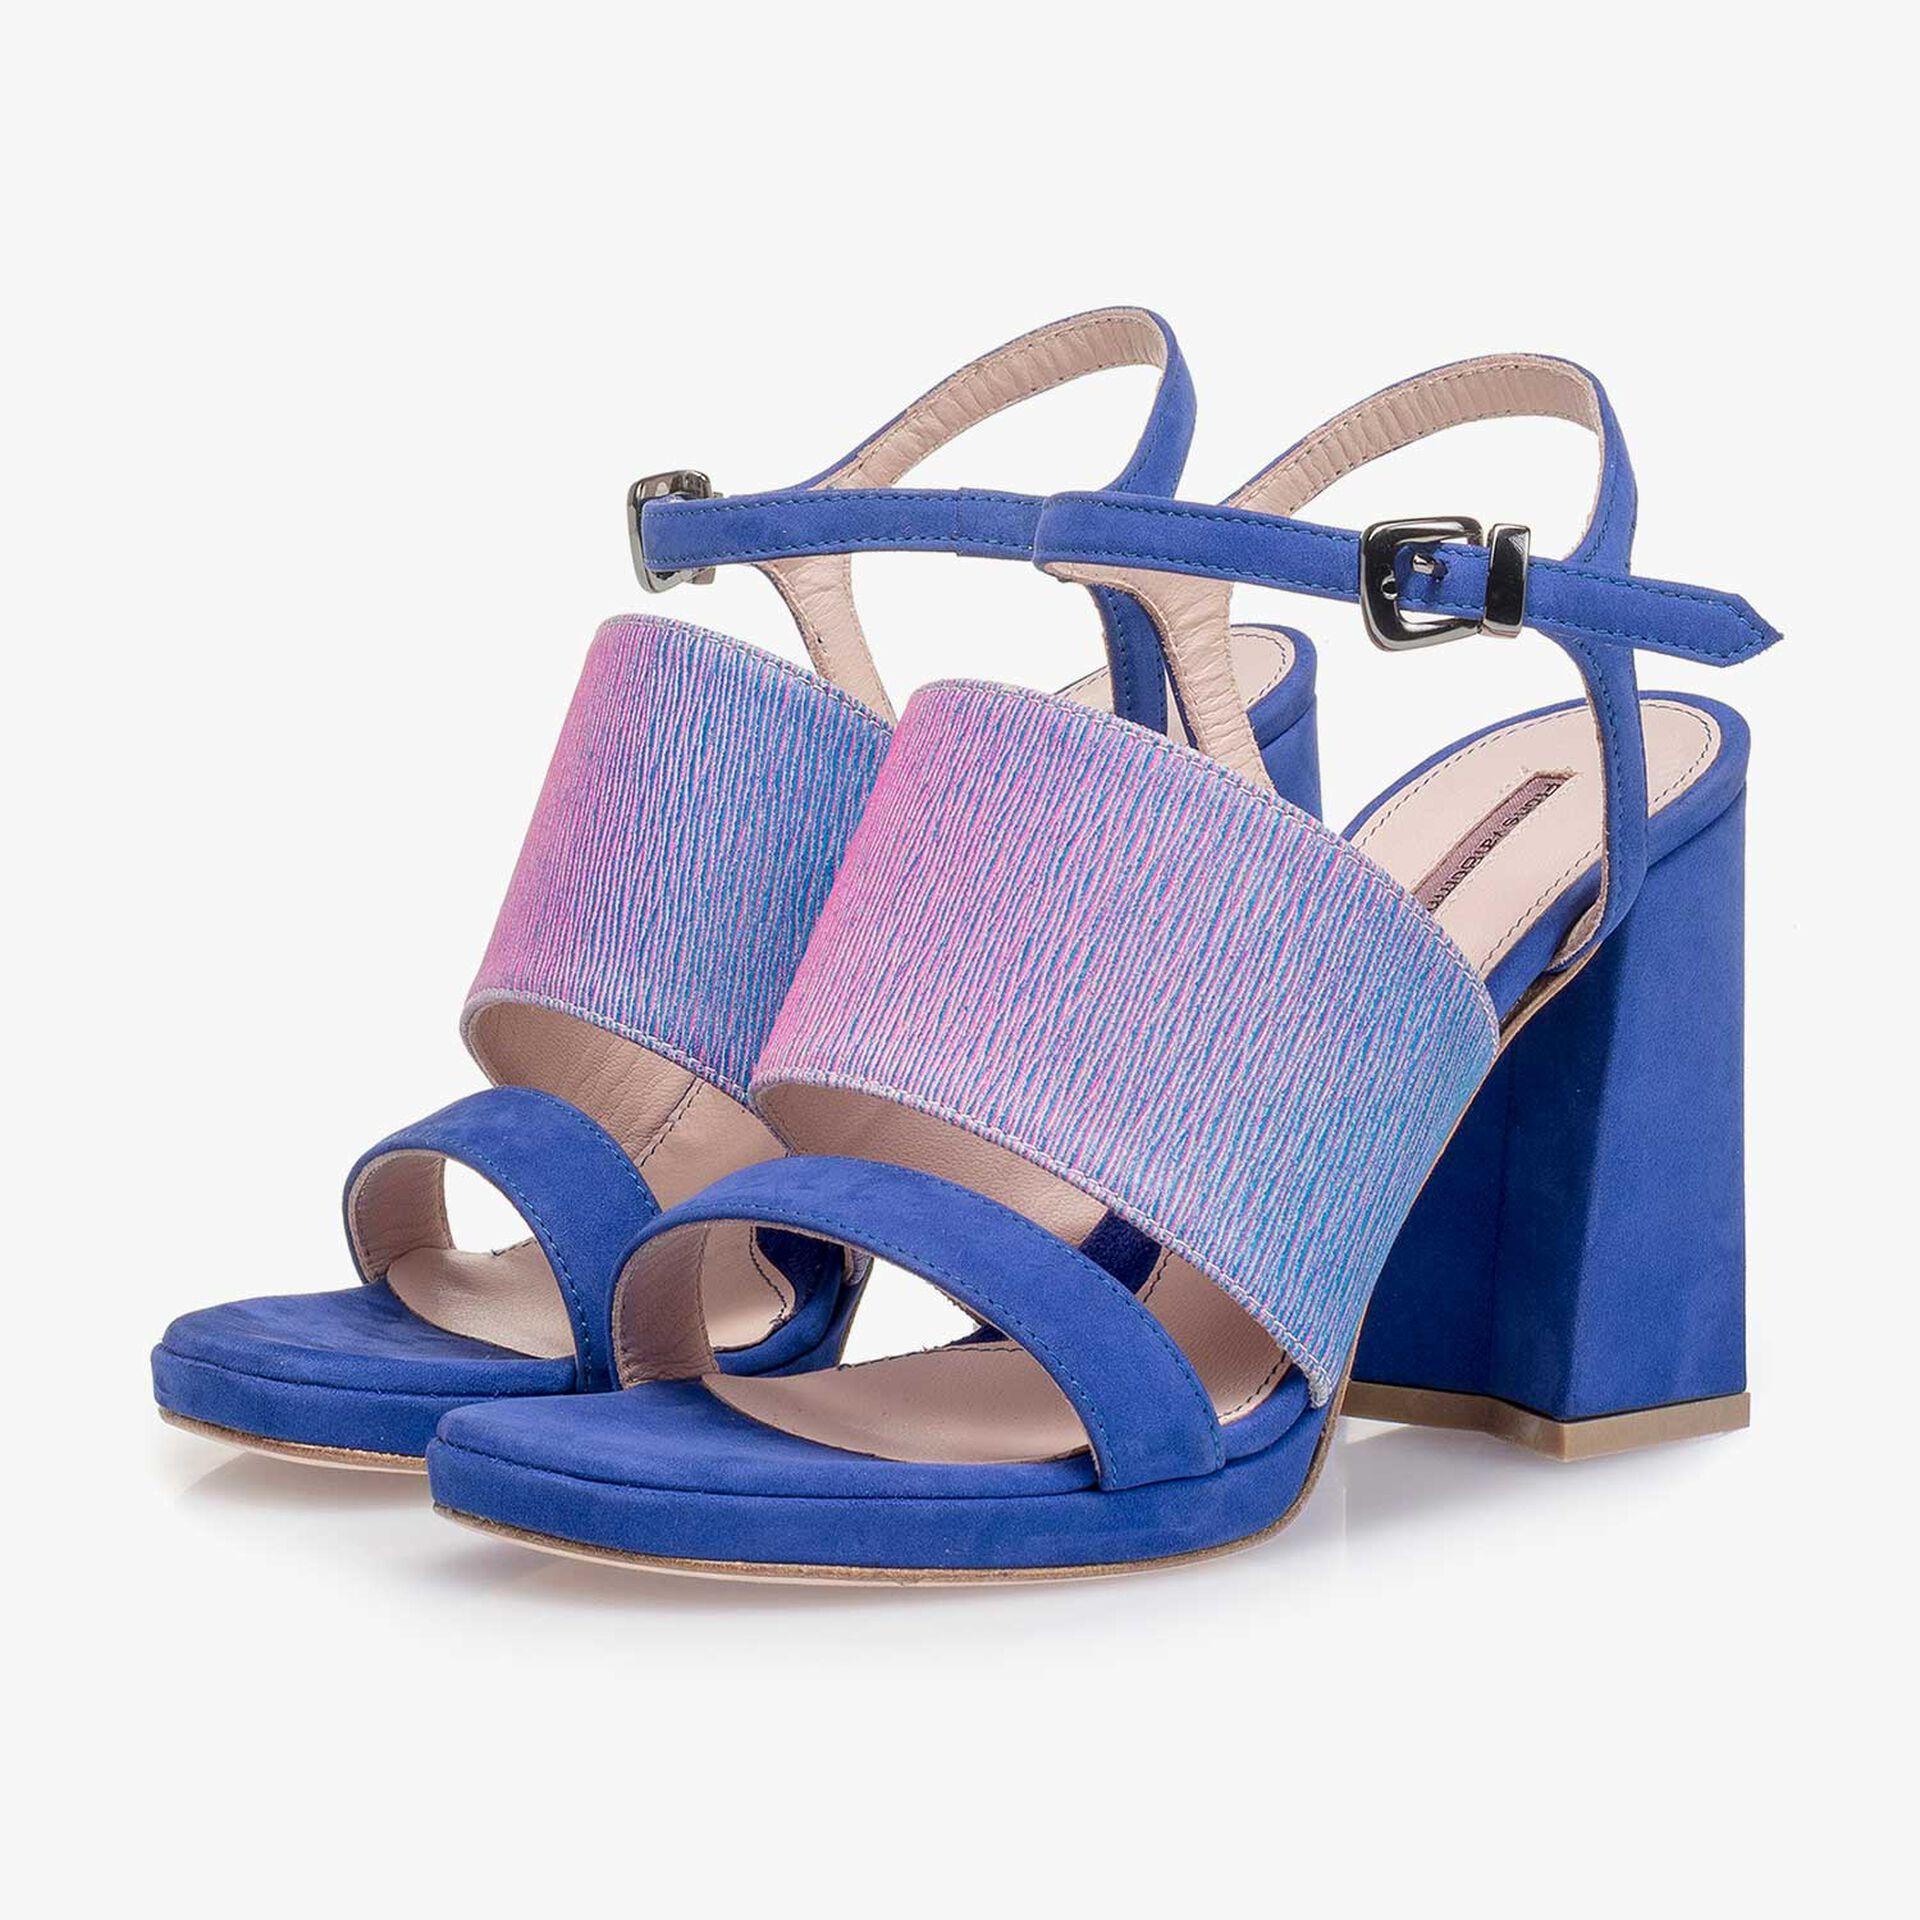 Blaue Wildleder-Sandalette mit lilafarbenem print